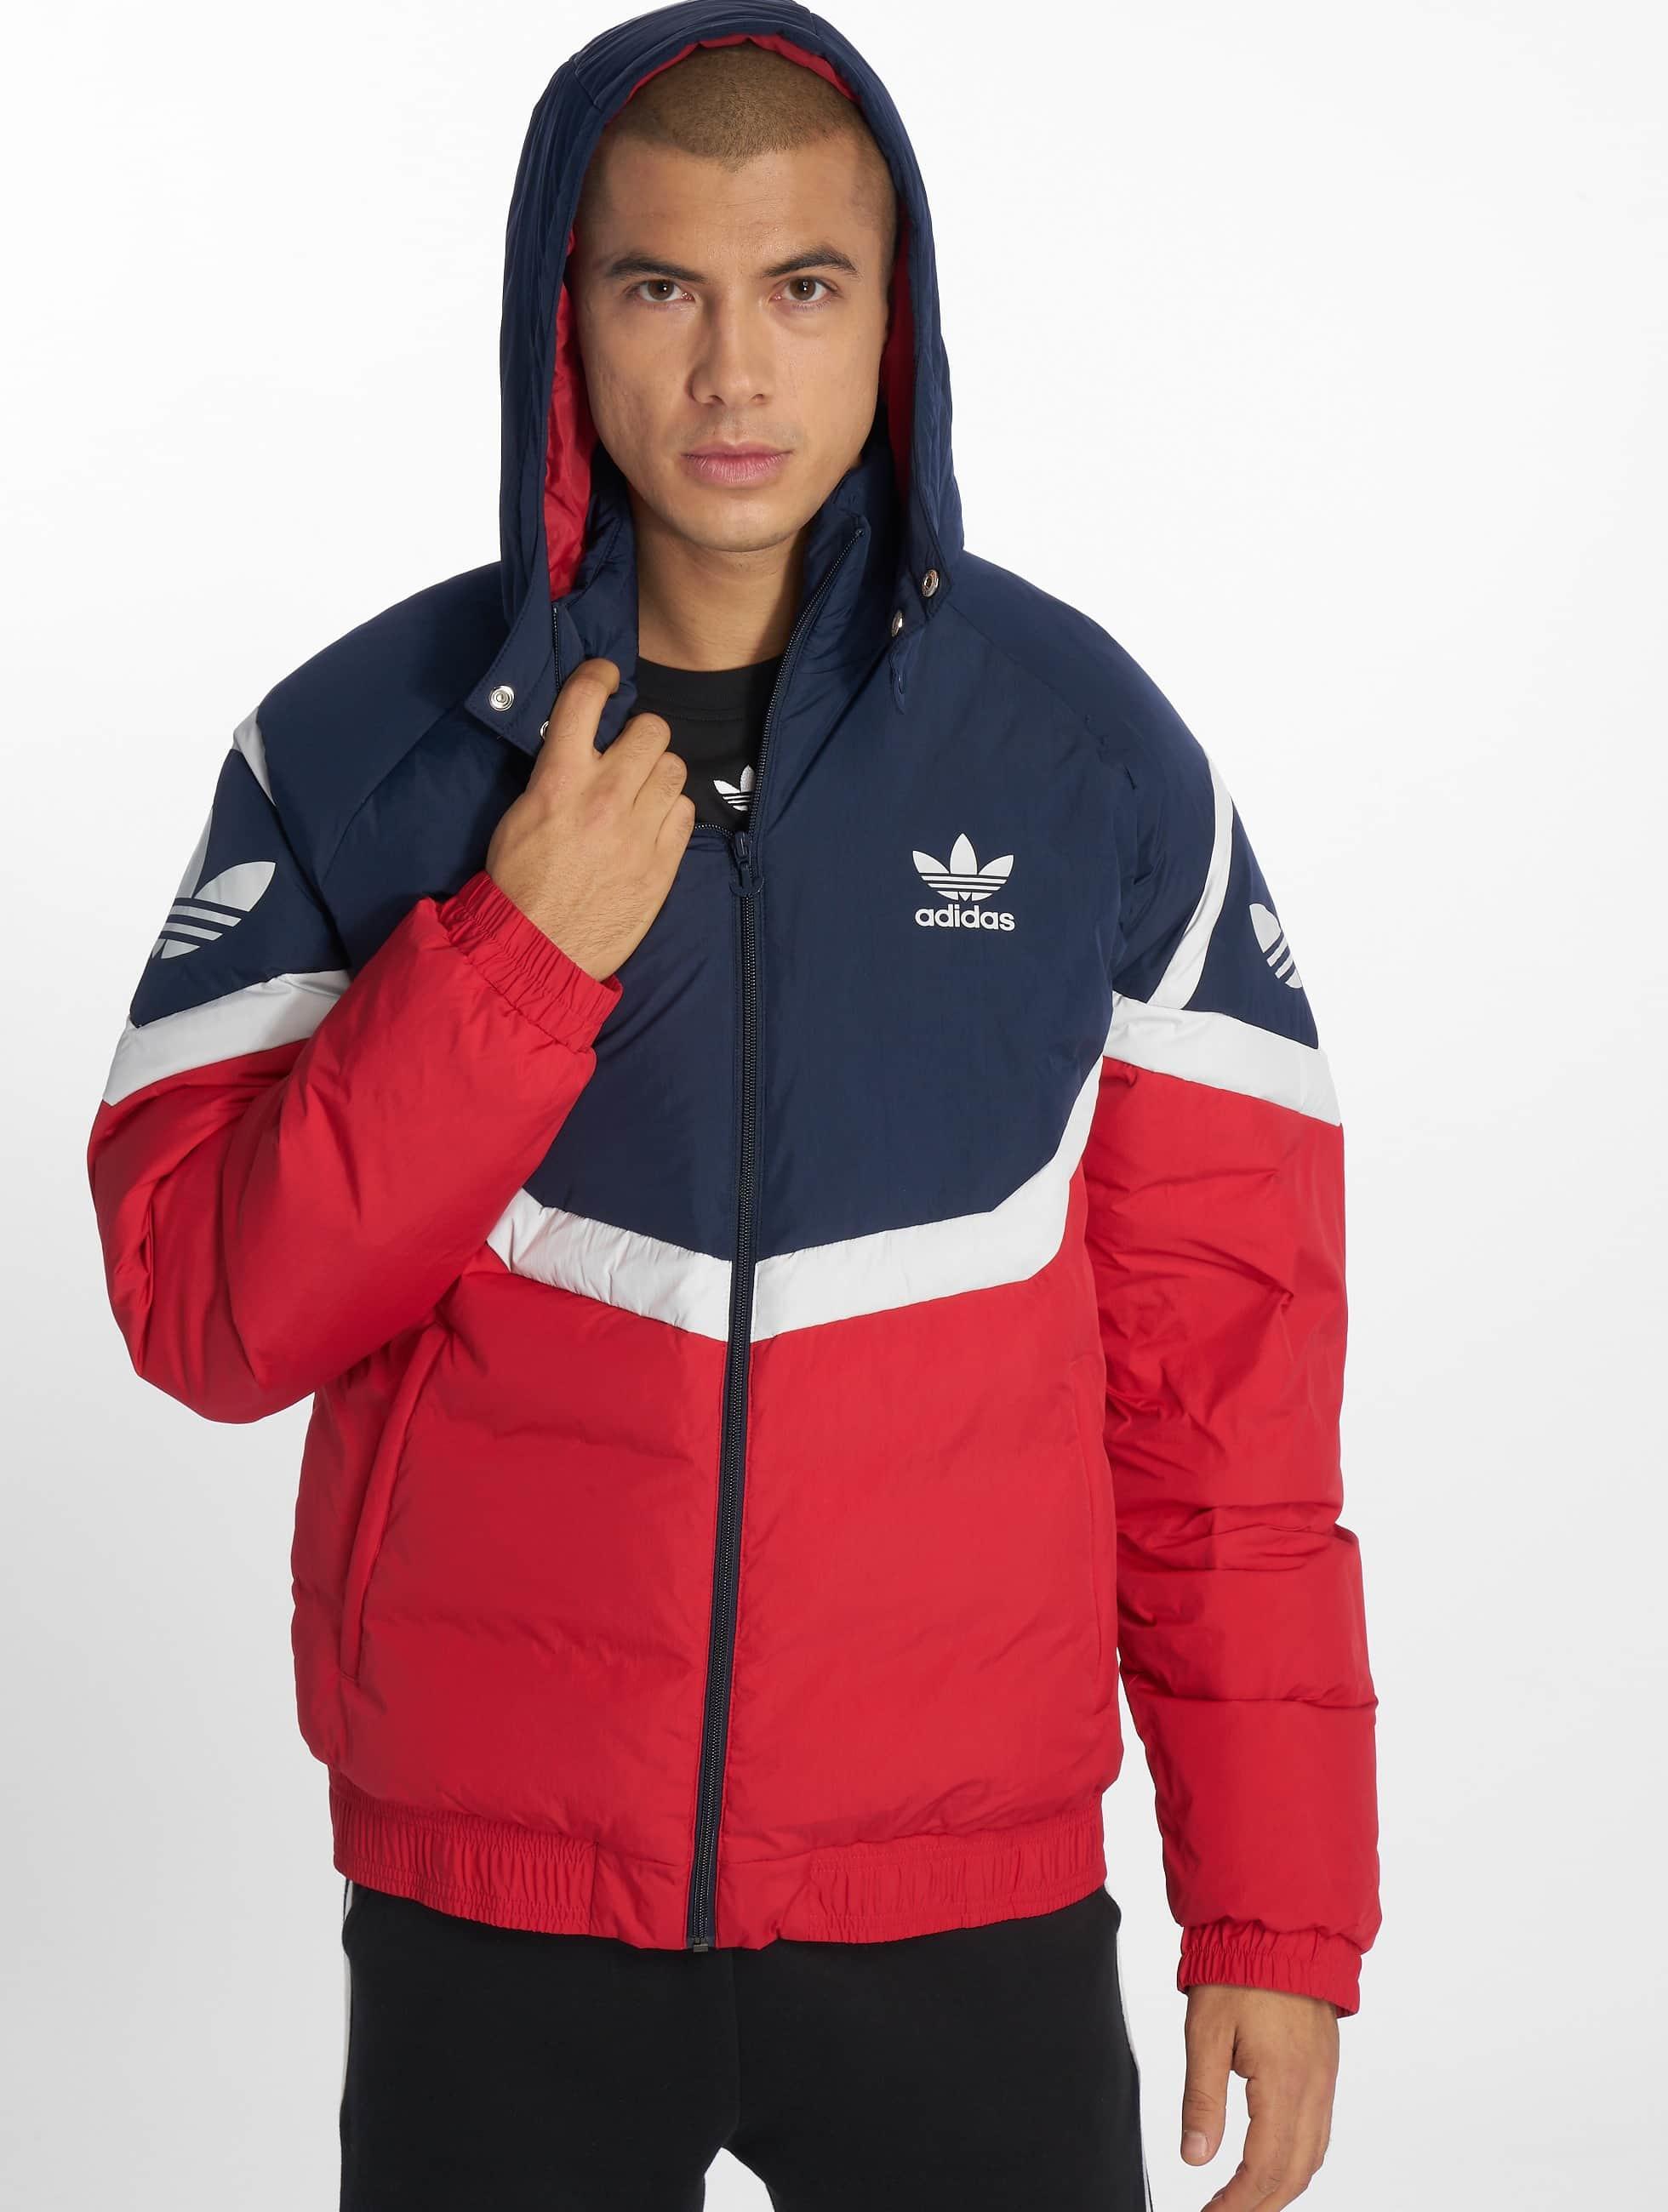 bf21799d5ef8c adidas originals | Originals rouge Homme Veste matelassée 597890